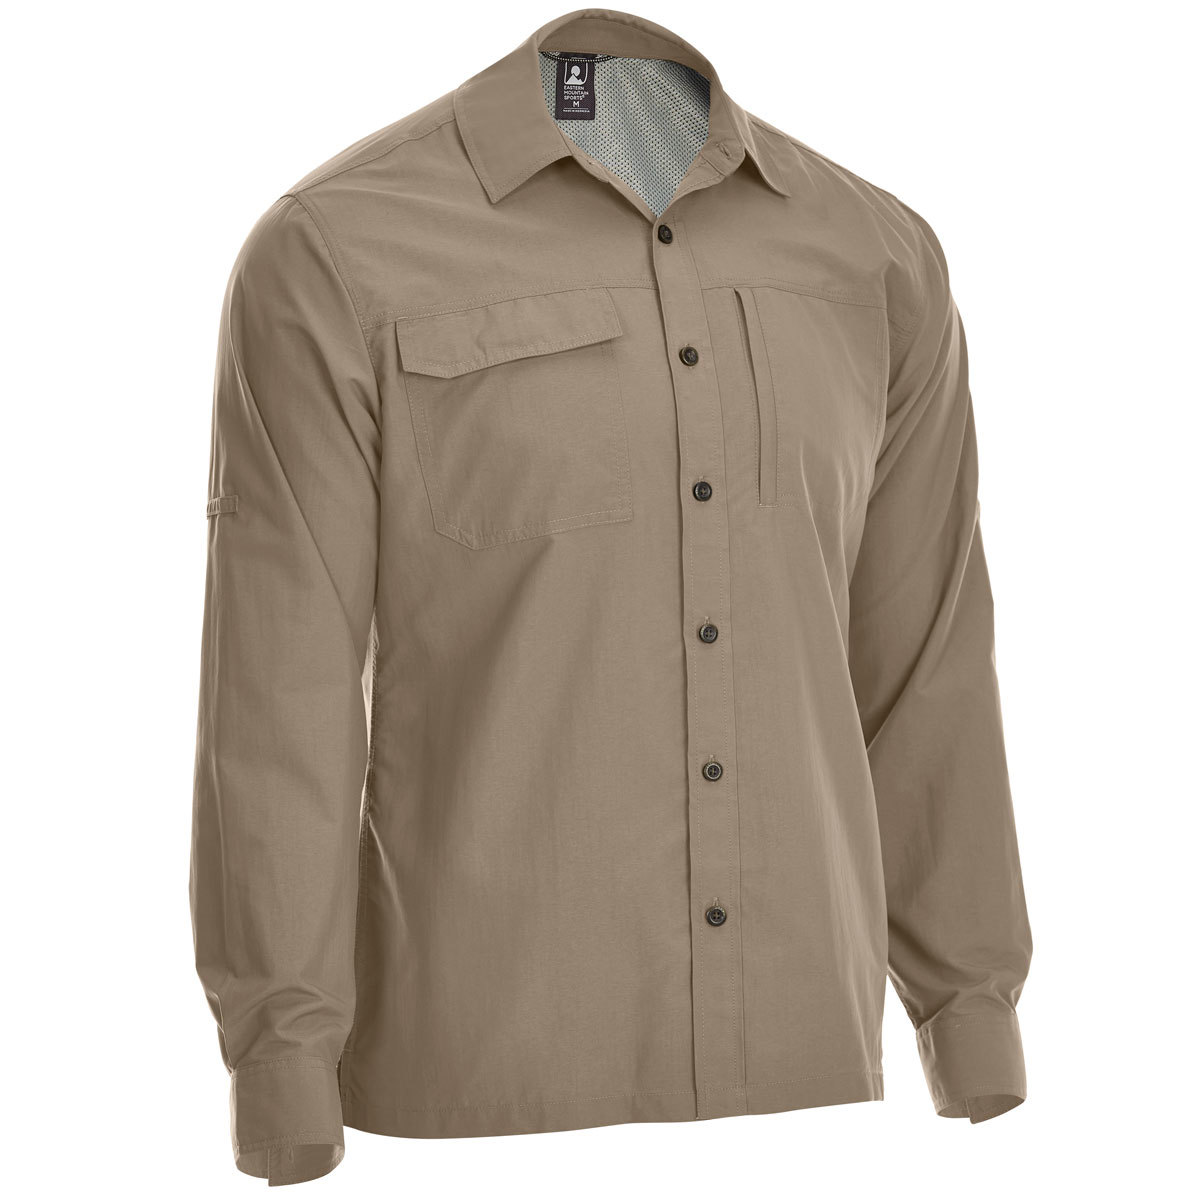 Ems Men's Trailhead Upf Long-Sleeve Shirt - Brown, XXL